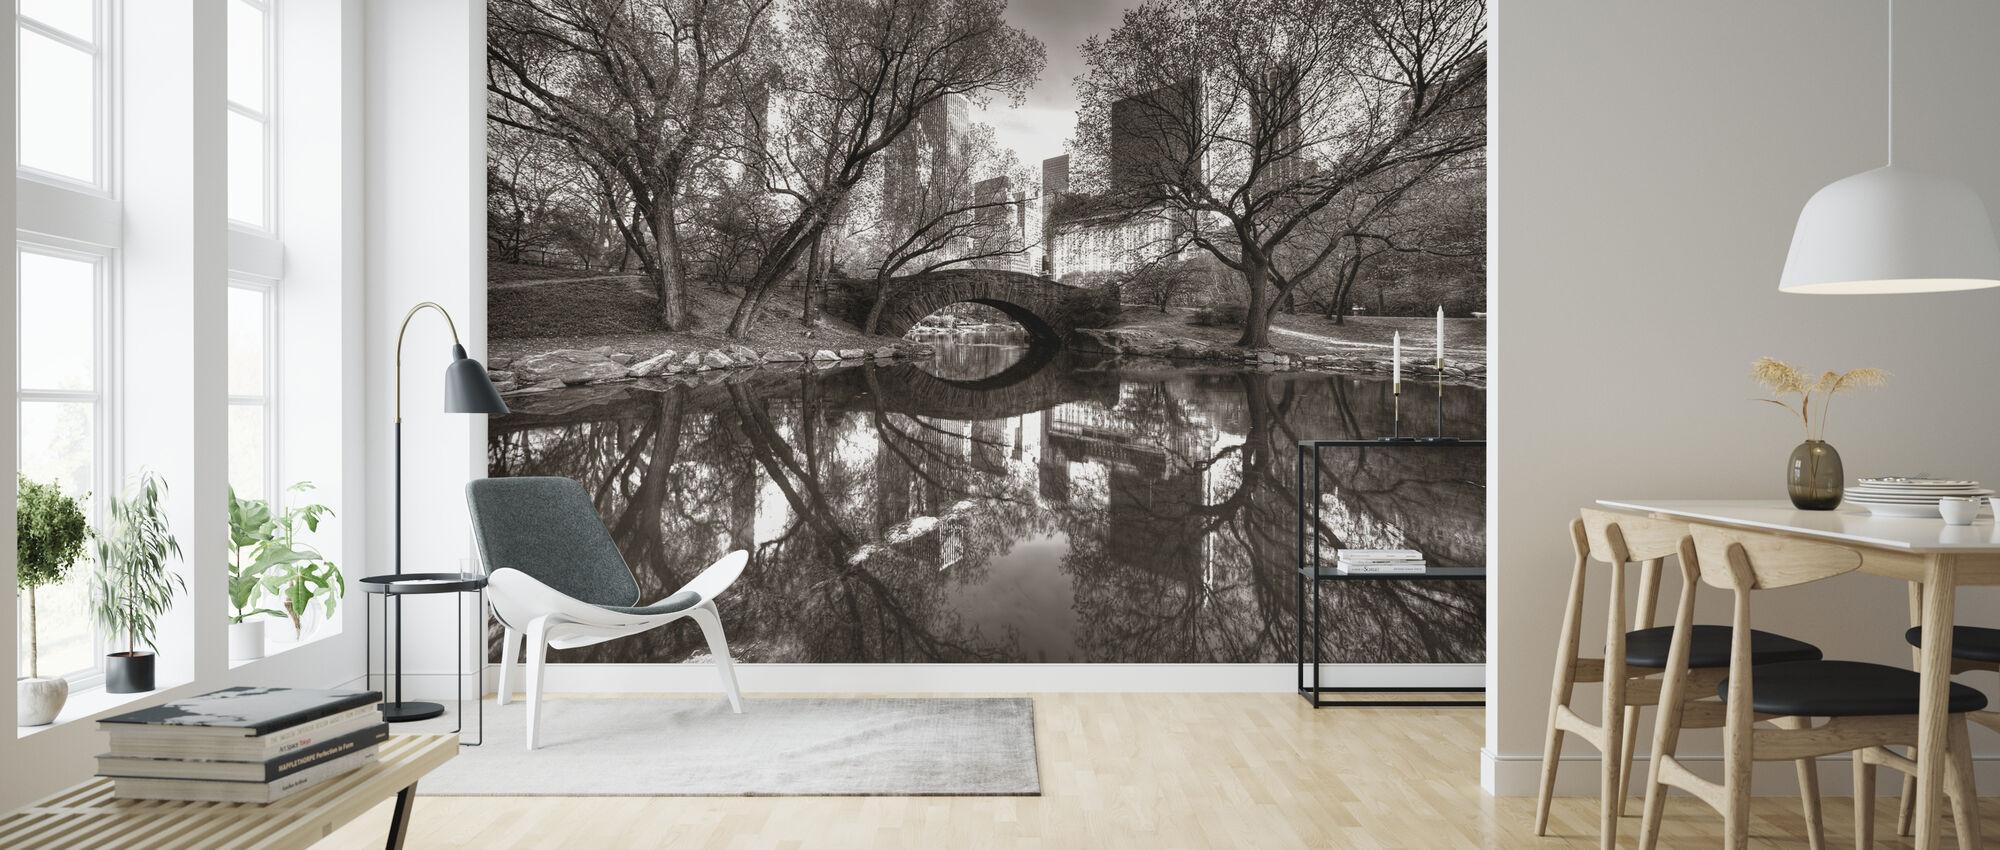 Bridge in Central Park, New York, USA - Wallpaper - Living Room